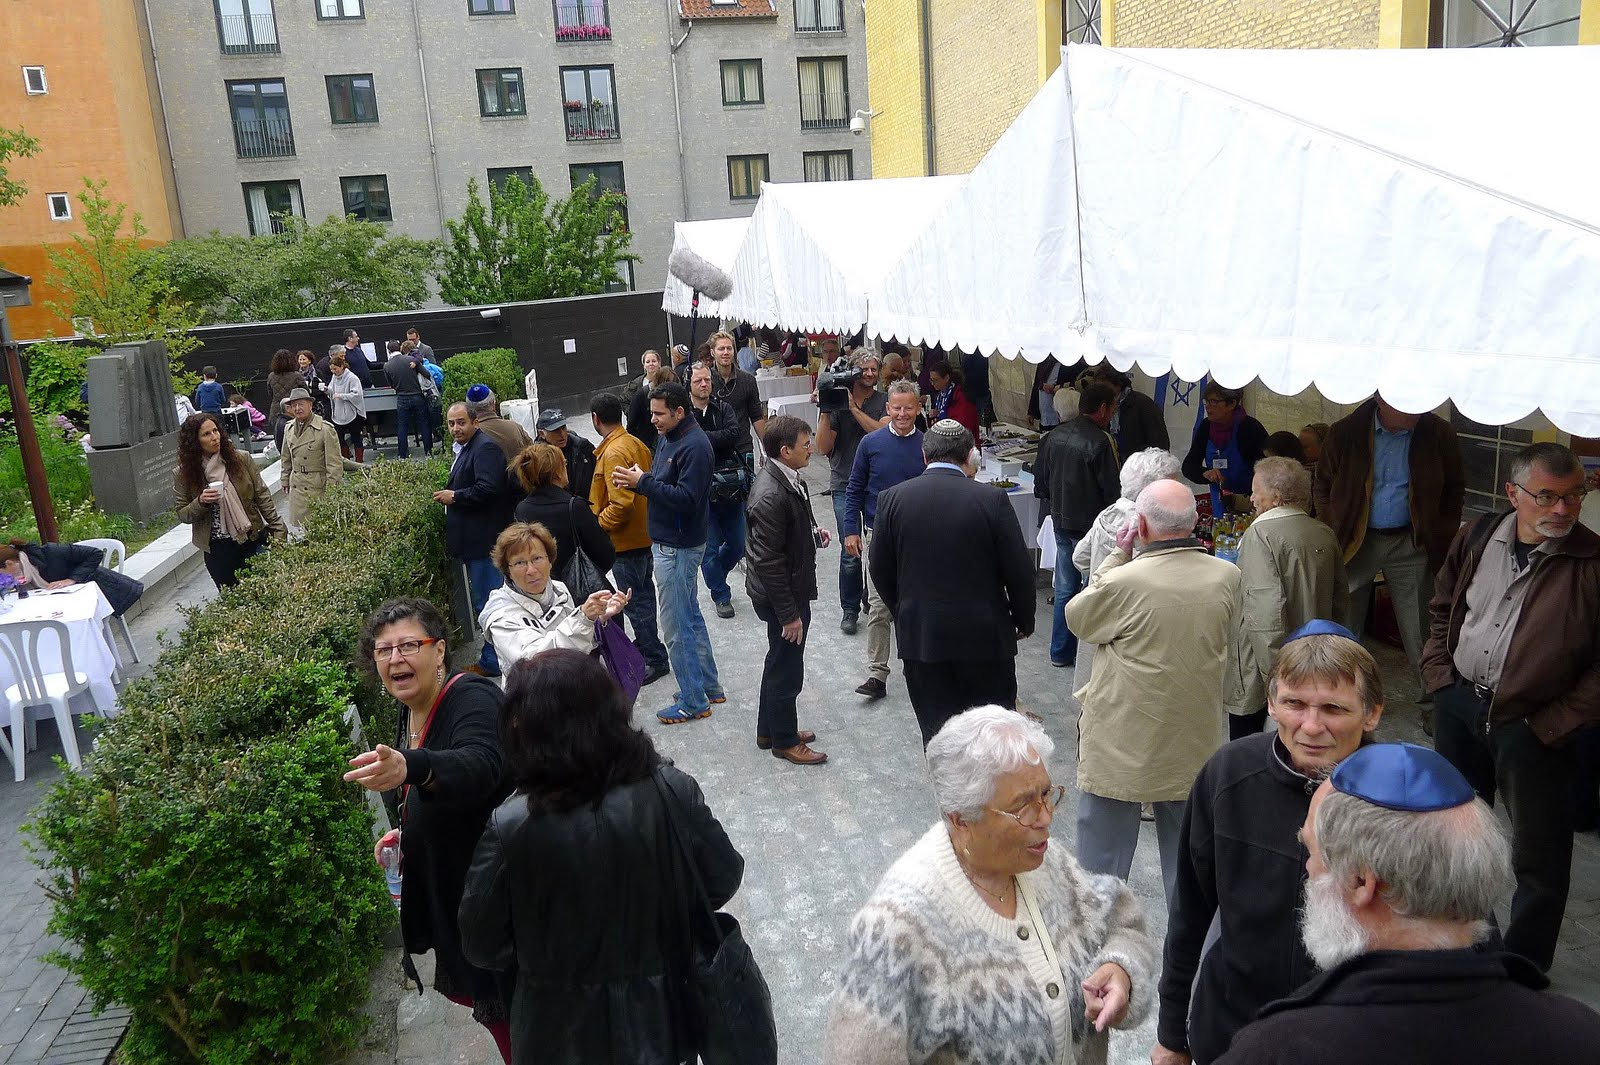 Frivillige til Jødisk Kulturfestival 31. maj - 5. juni 2016